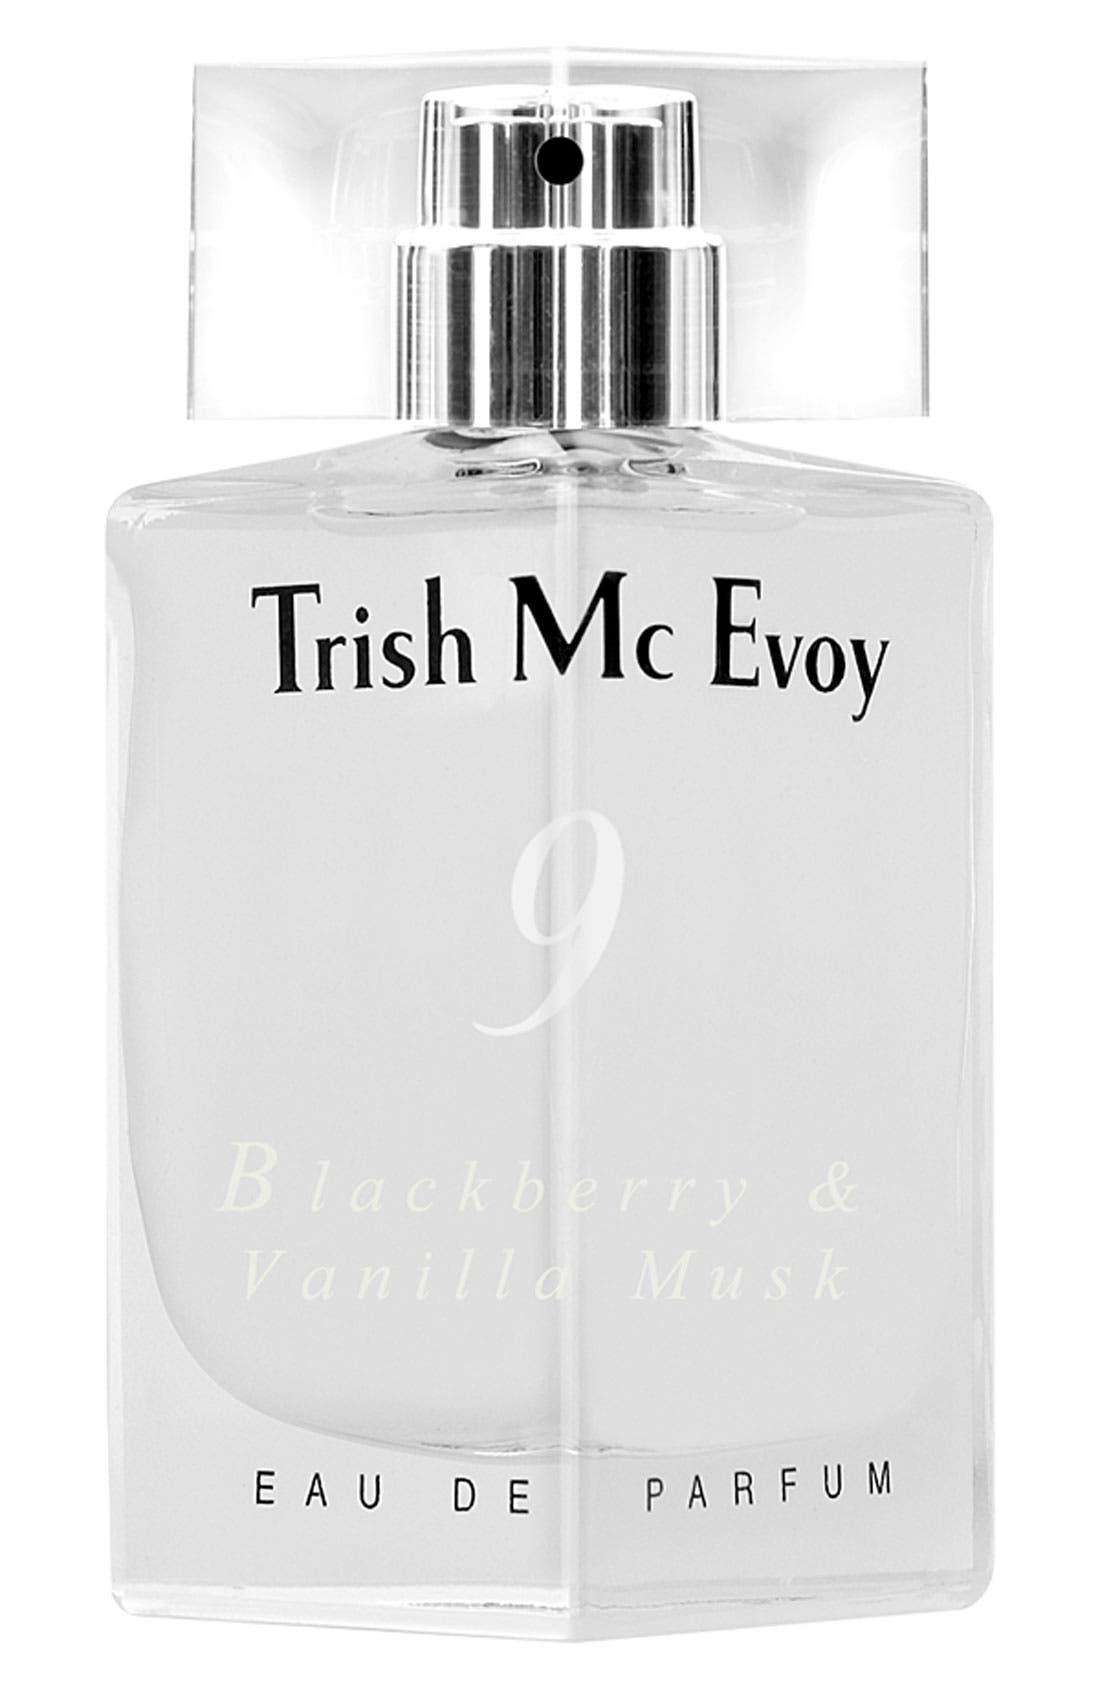 Trish McEvoy 'No. 9 Blackberry & Vanilla Musk' Eau de Parfum